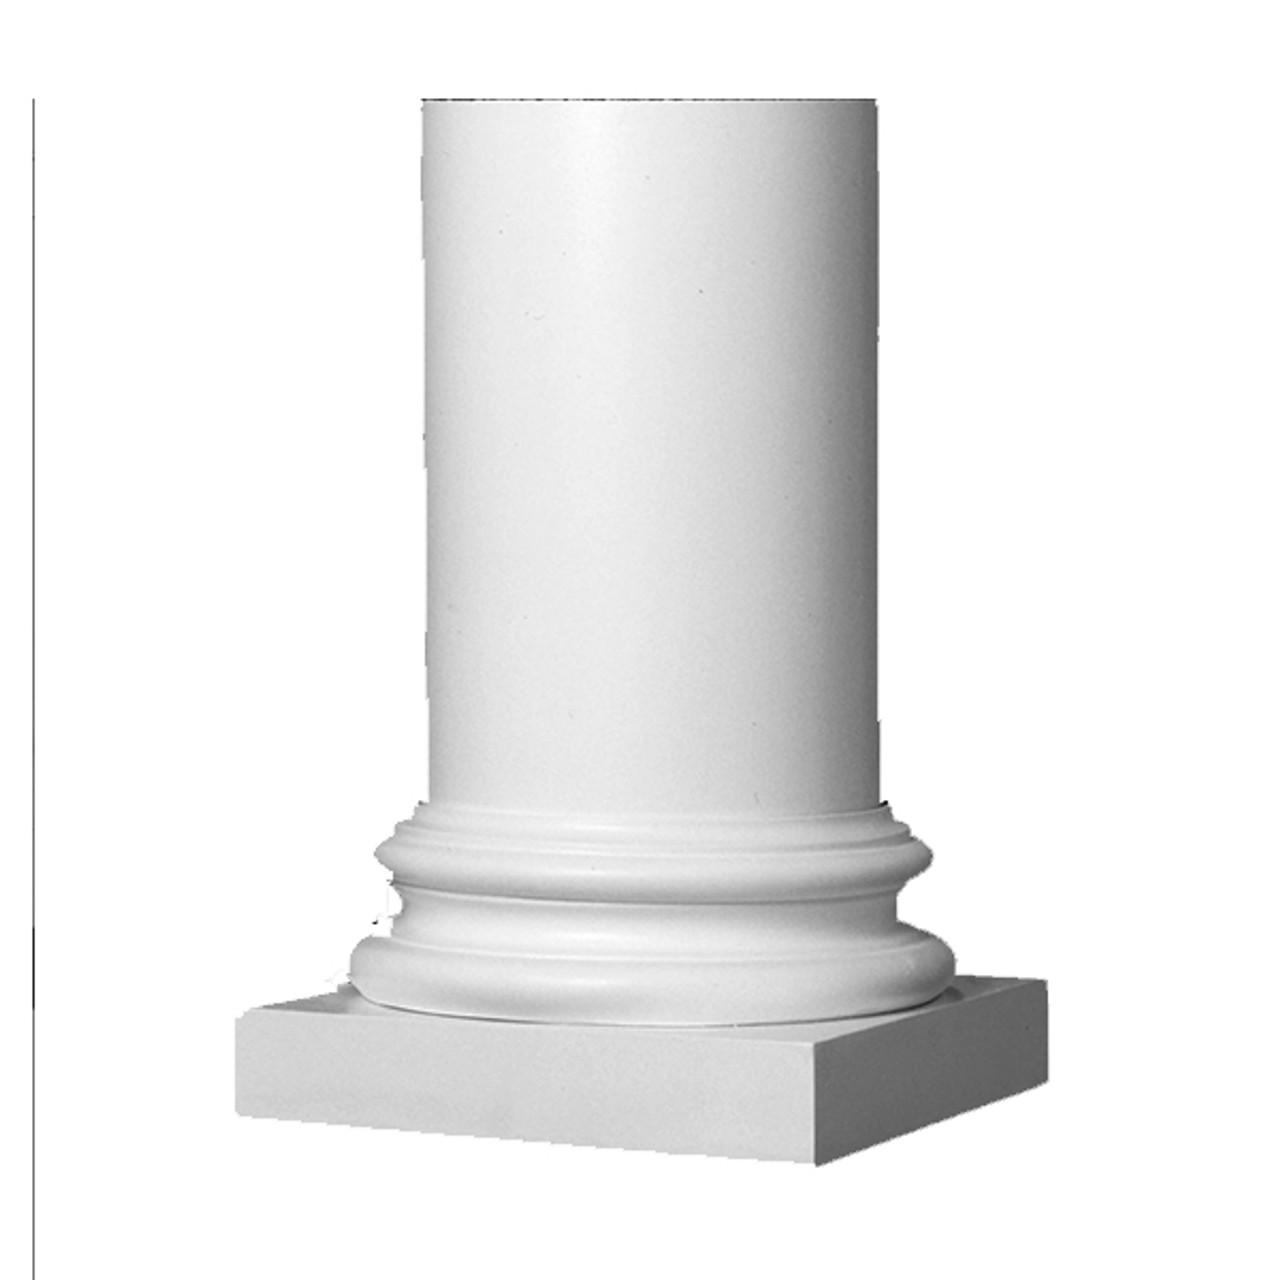 Column 8' Plain Roman Column